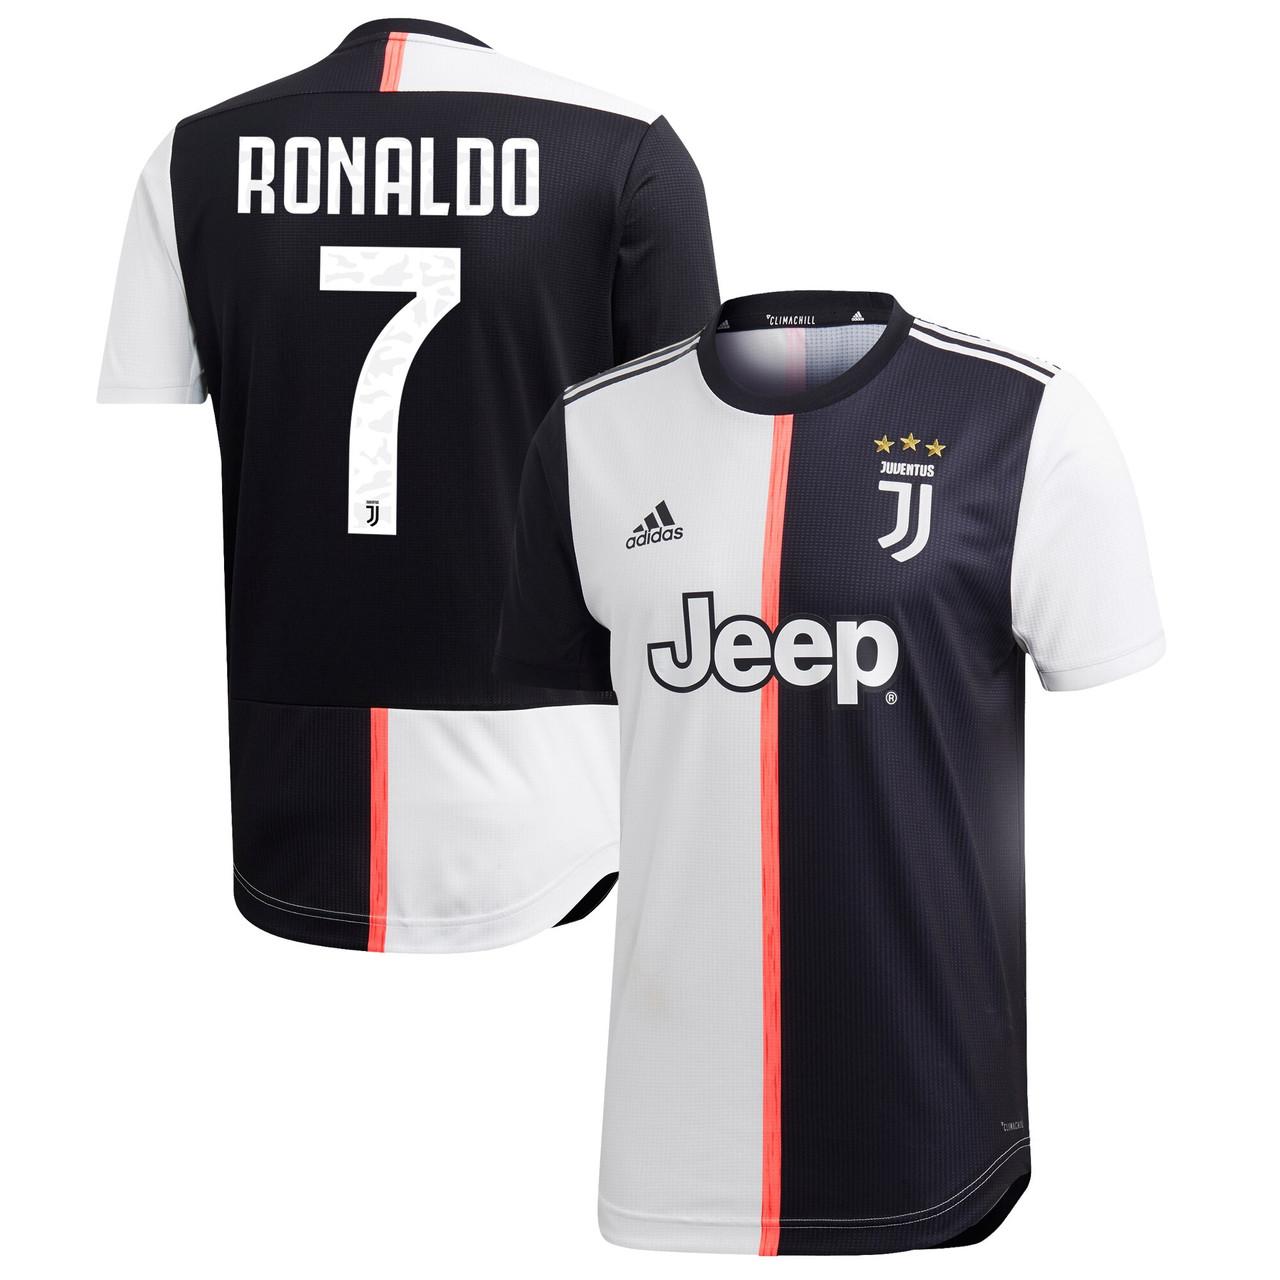 Confiar soborno Estoy orgulloso  ADIDAS JUVENTUS 2020 HOME AUTHENTIC RONALDO JERSEY - Soccer Plus